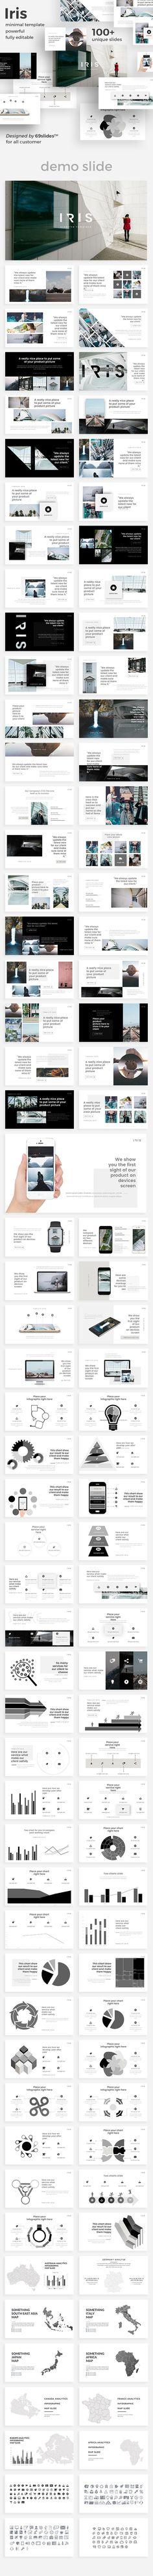 Iris Minimal Google Slide Template - Google Slides Presentation Templates #keynote #powerpoint